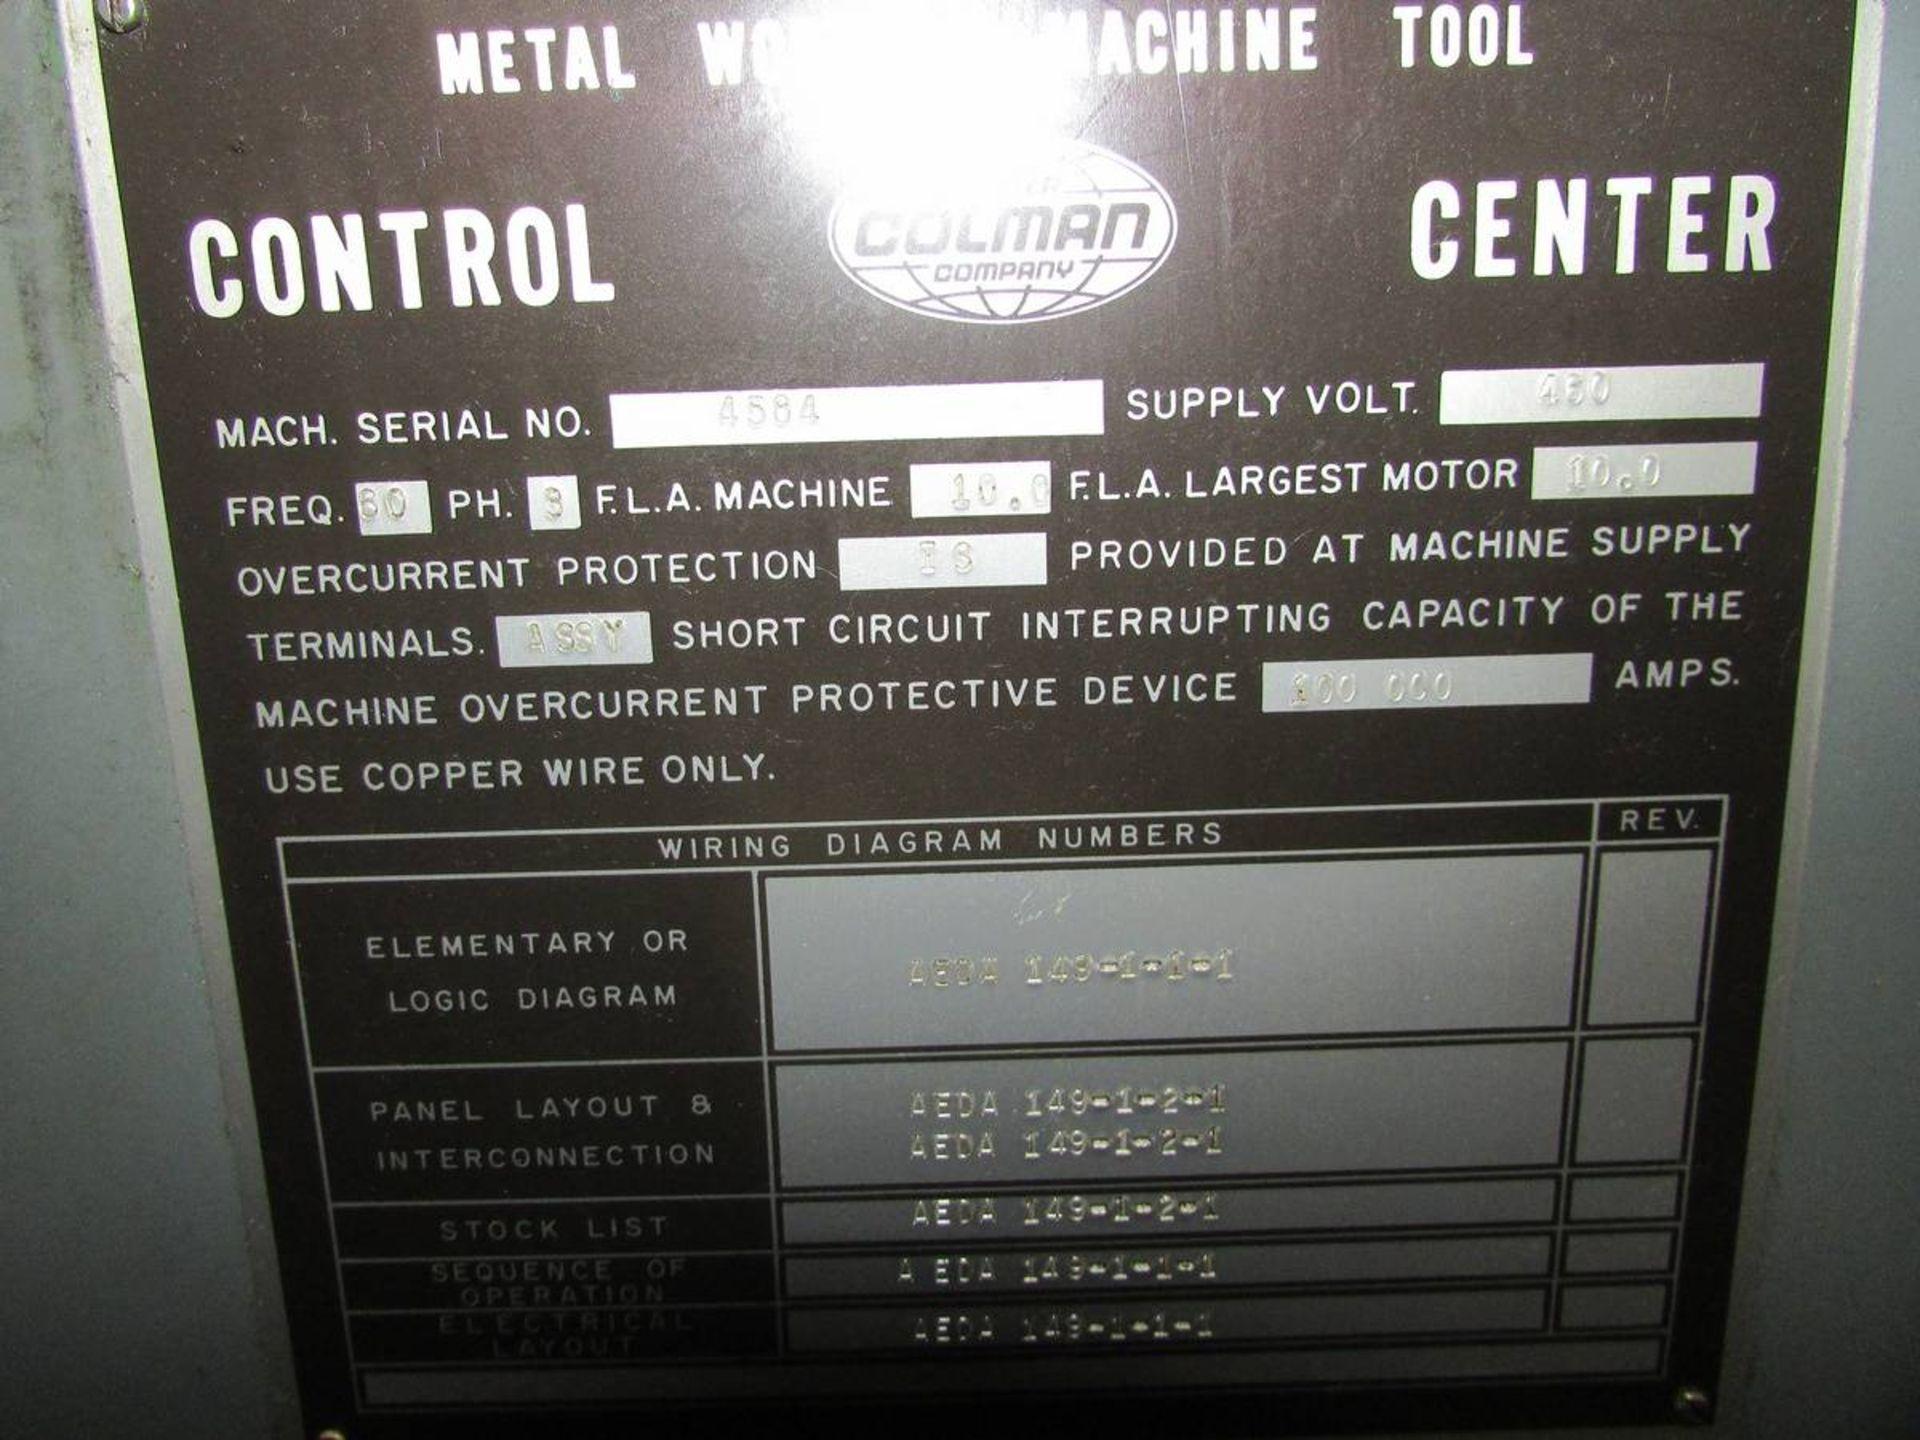 Barber Colman 16-16 Gear Hobbing Machine - Image 22 of 24